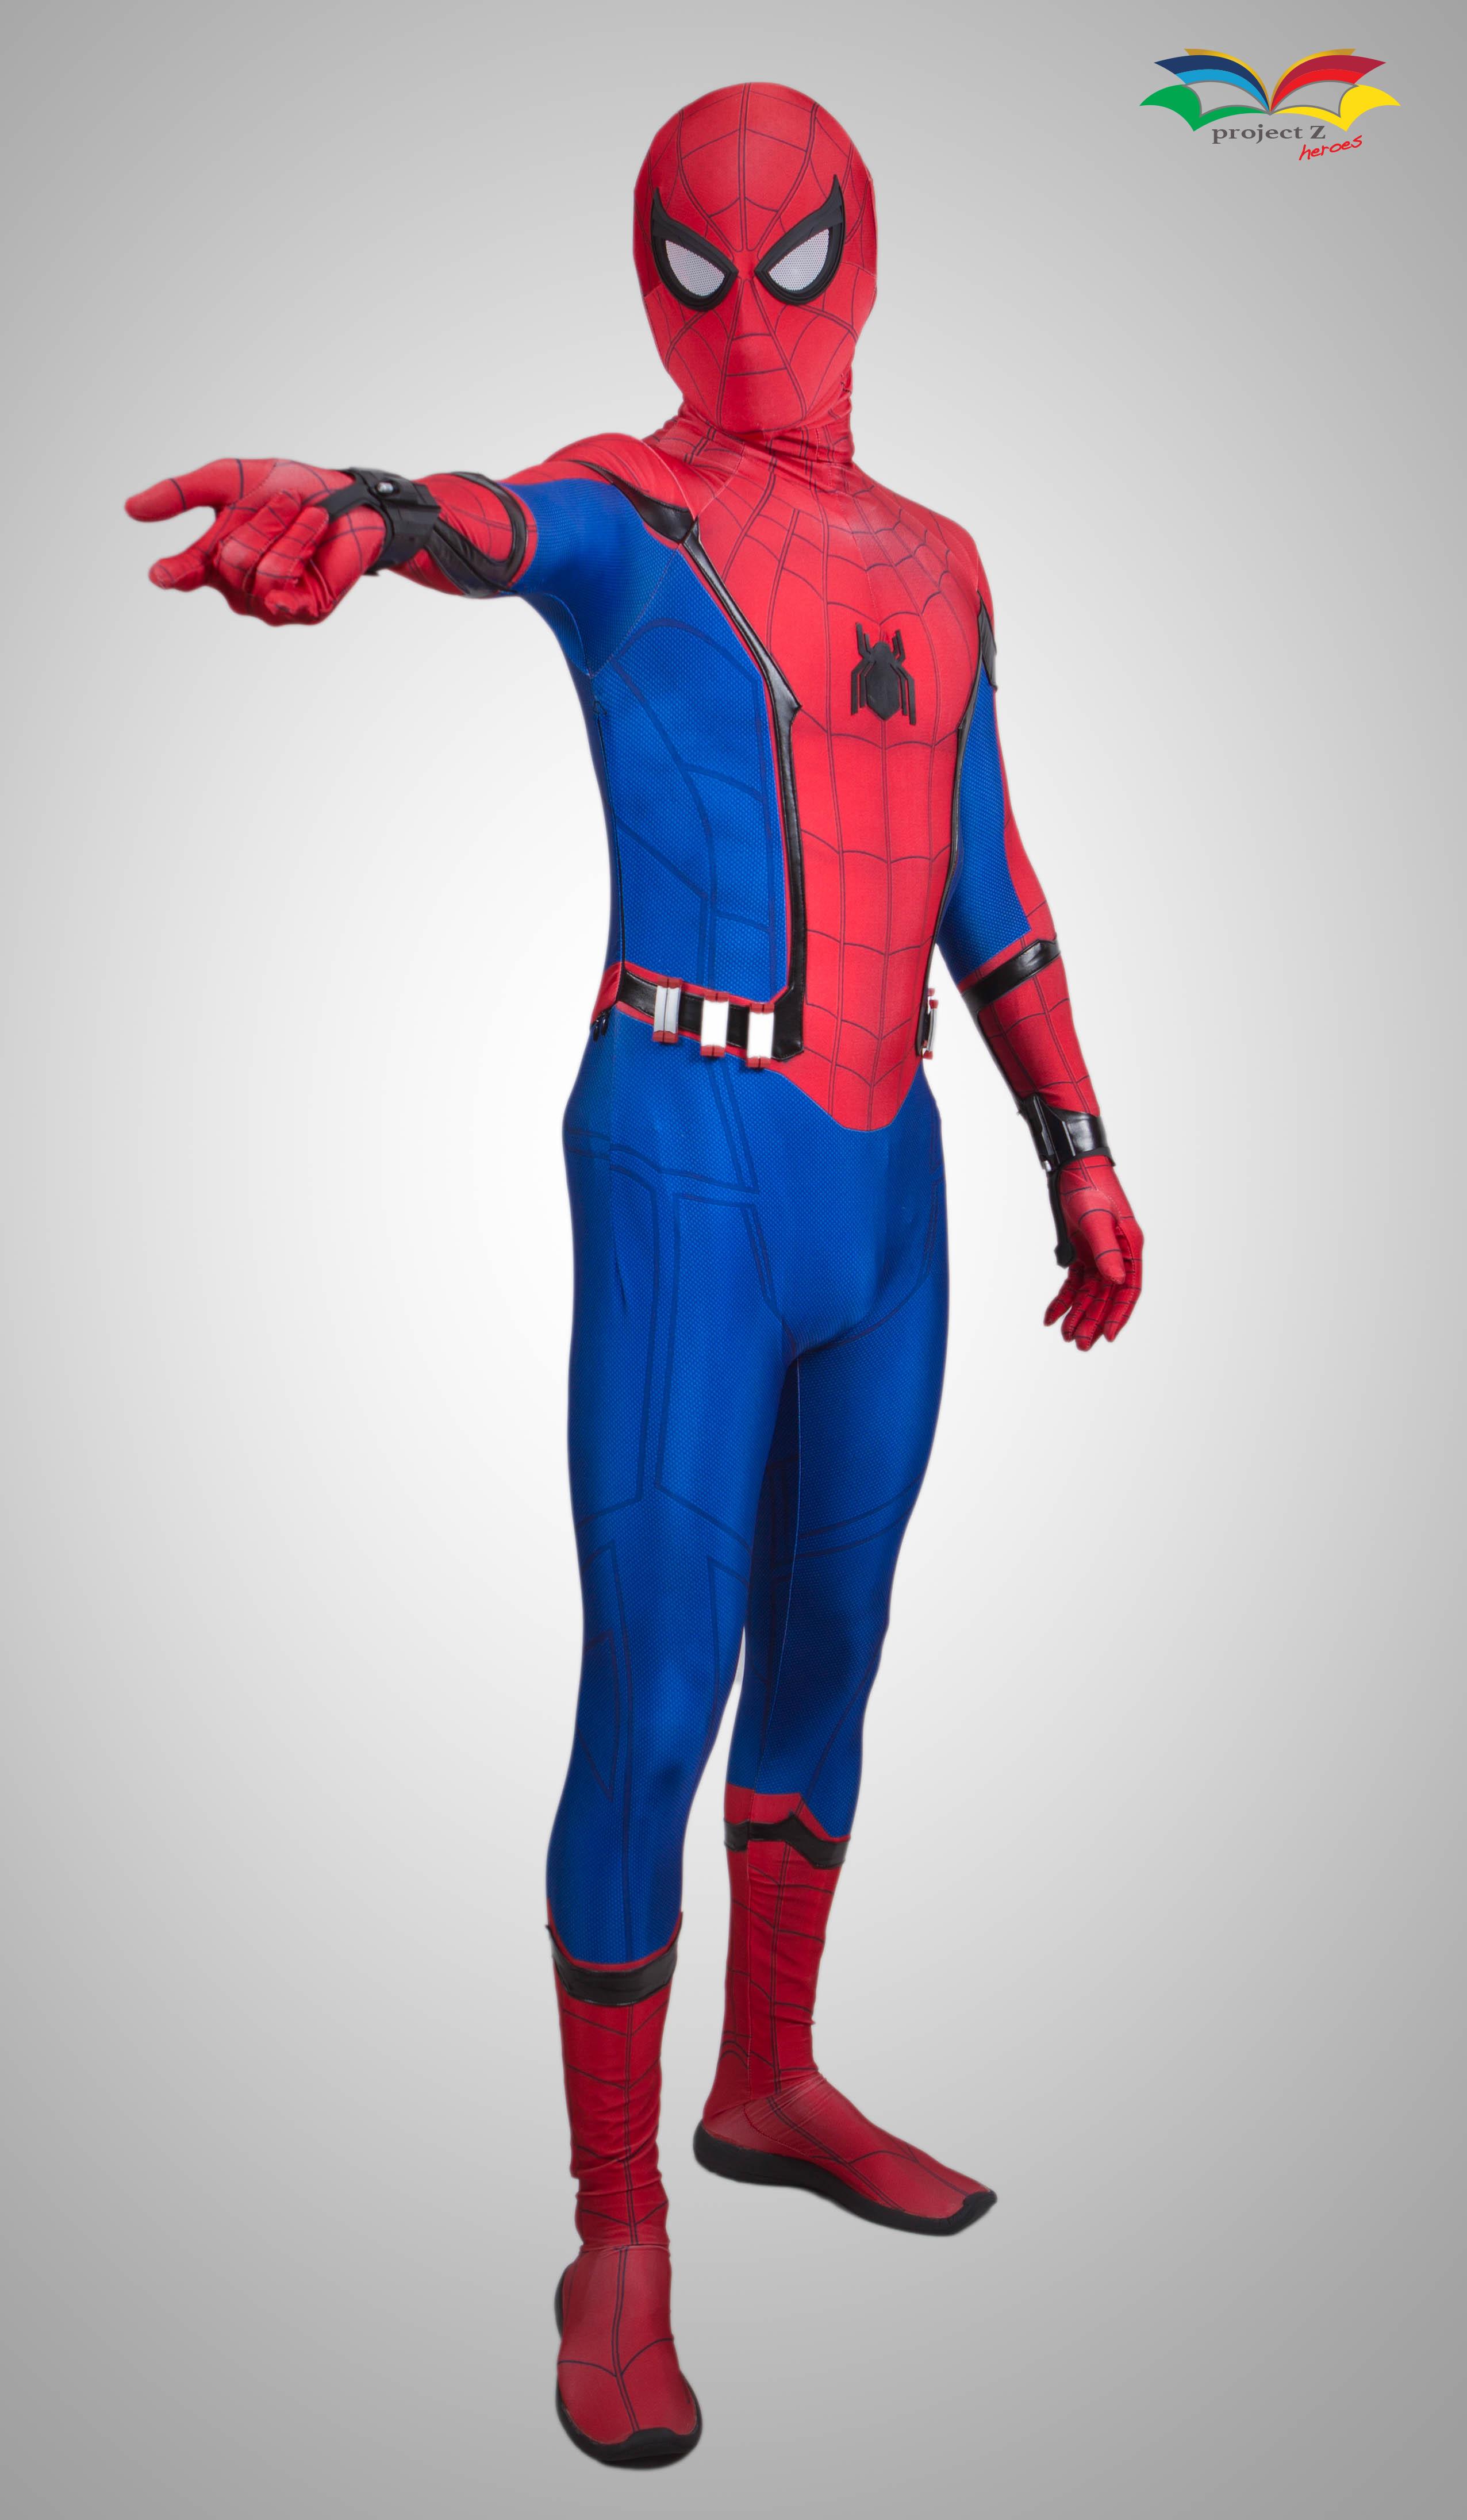 Spiderman homecoming costume shooting web